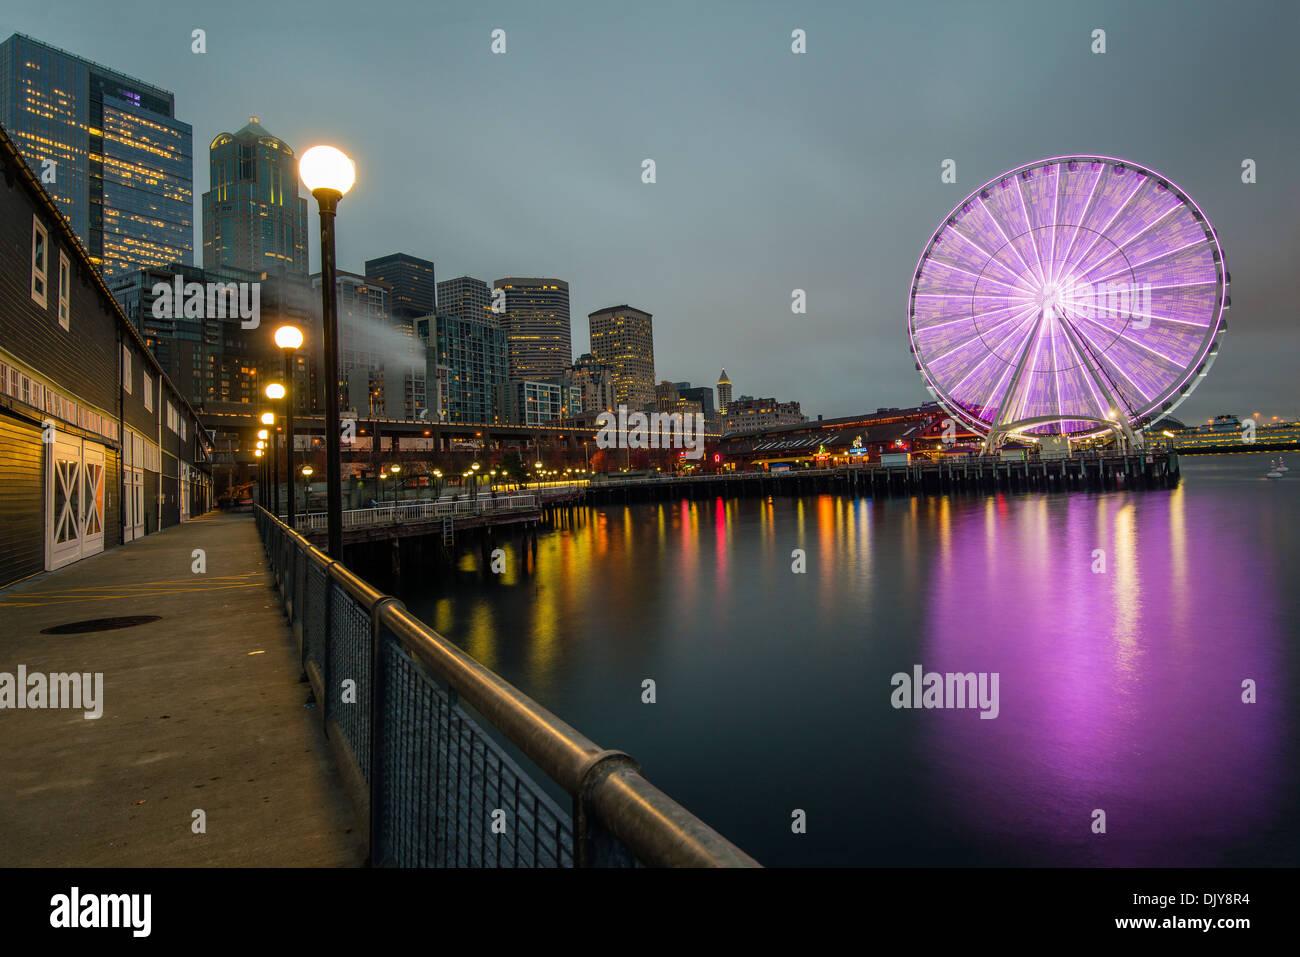 Waterfront and Great Wheel by night, Seattle, Washington, USA - Stock Image